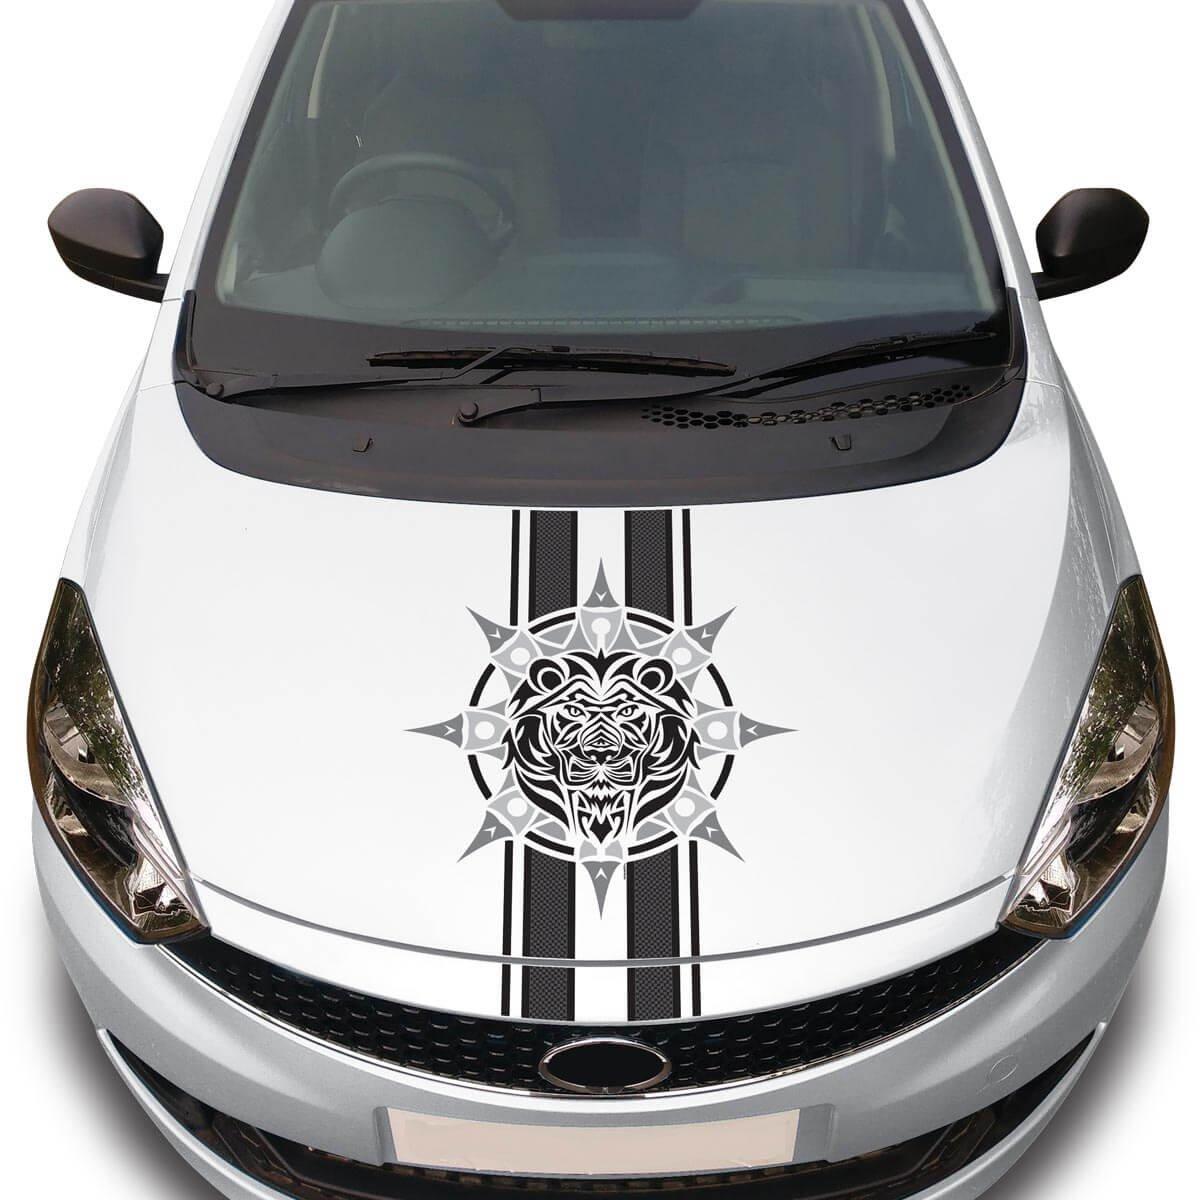 Autographix car sticker graphic decals wild beast car styling accessories amazon in car motorbike